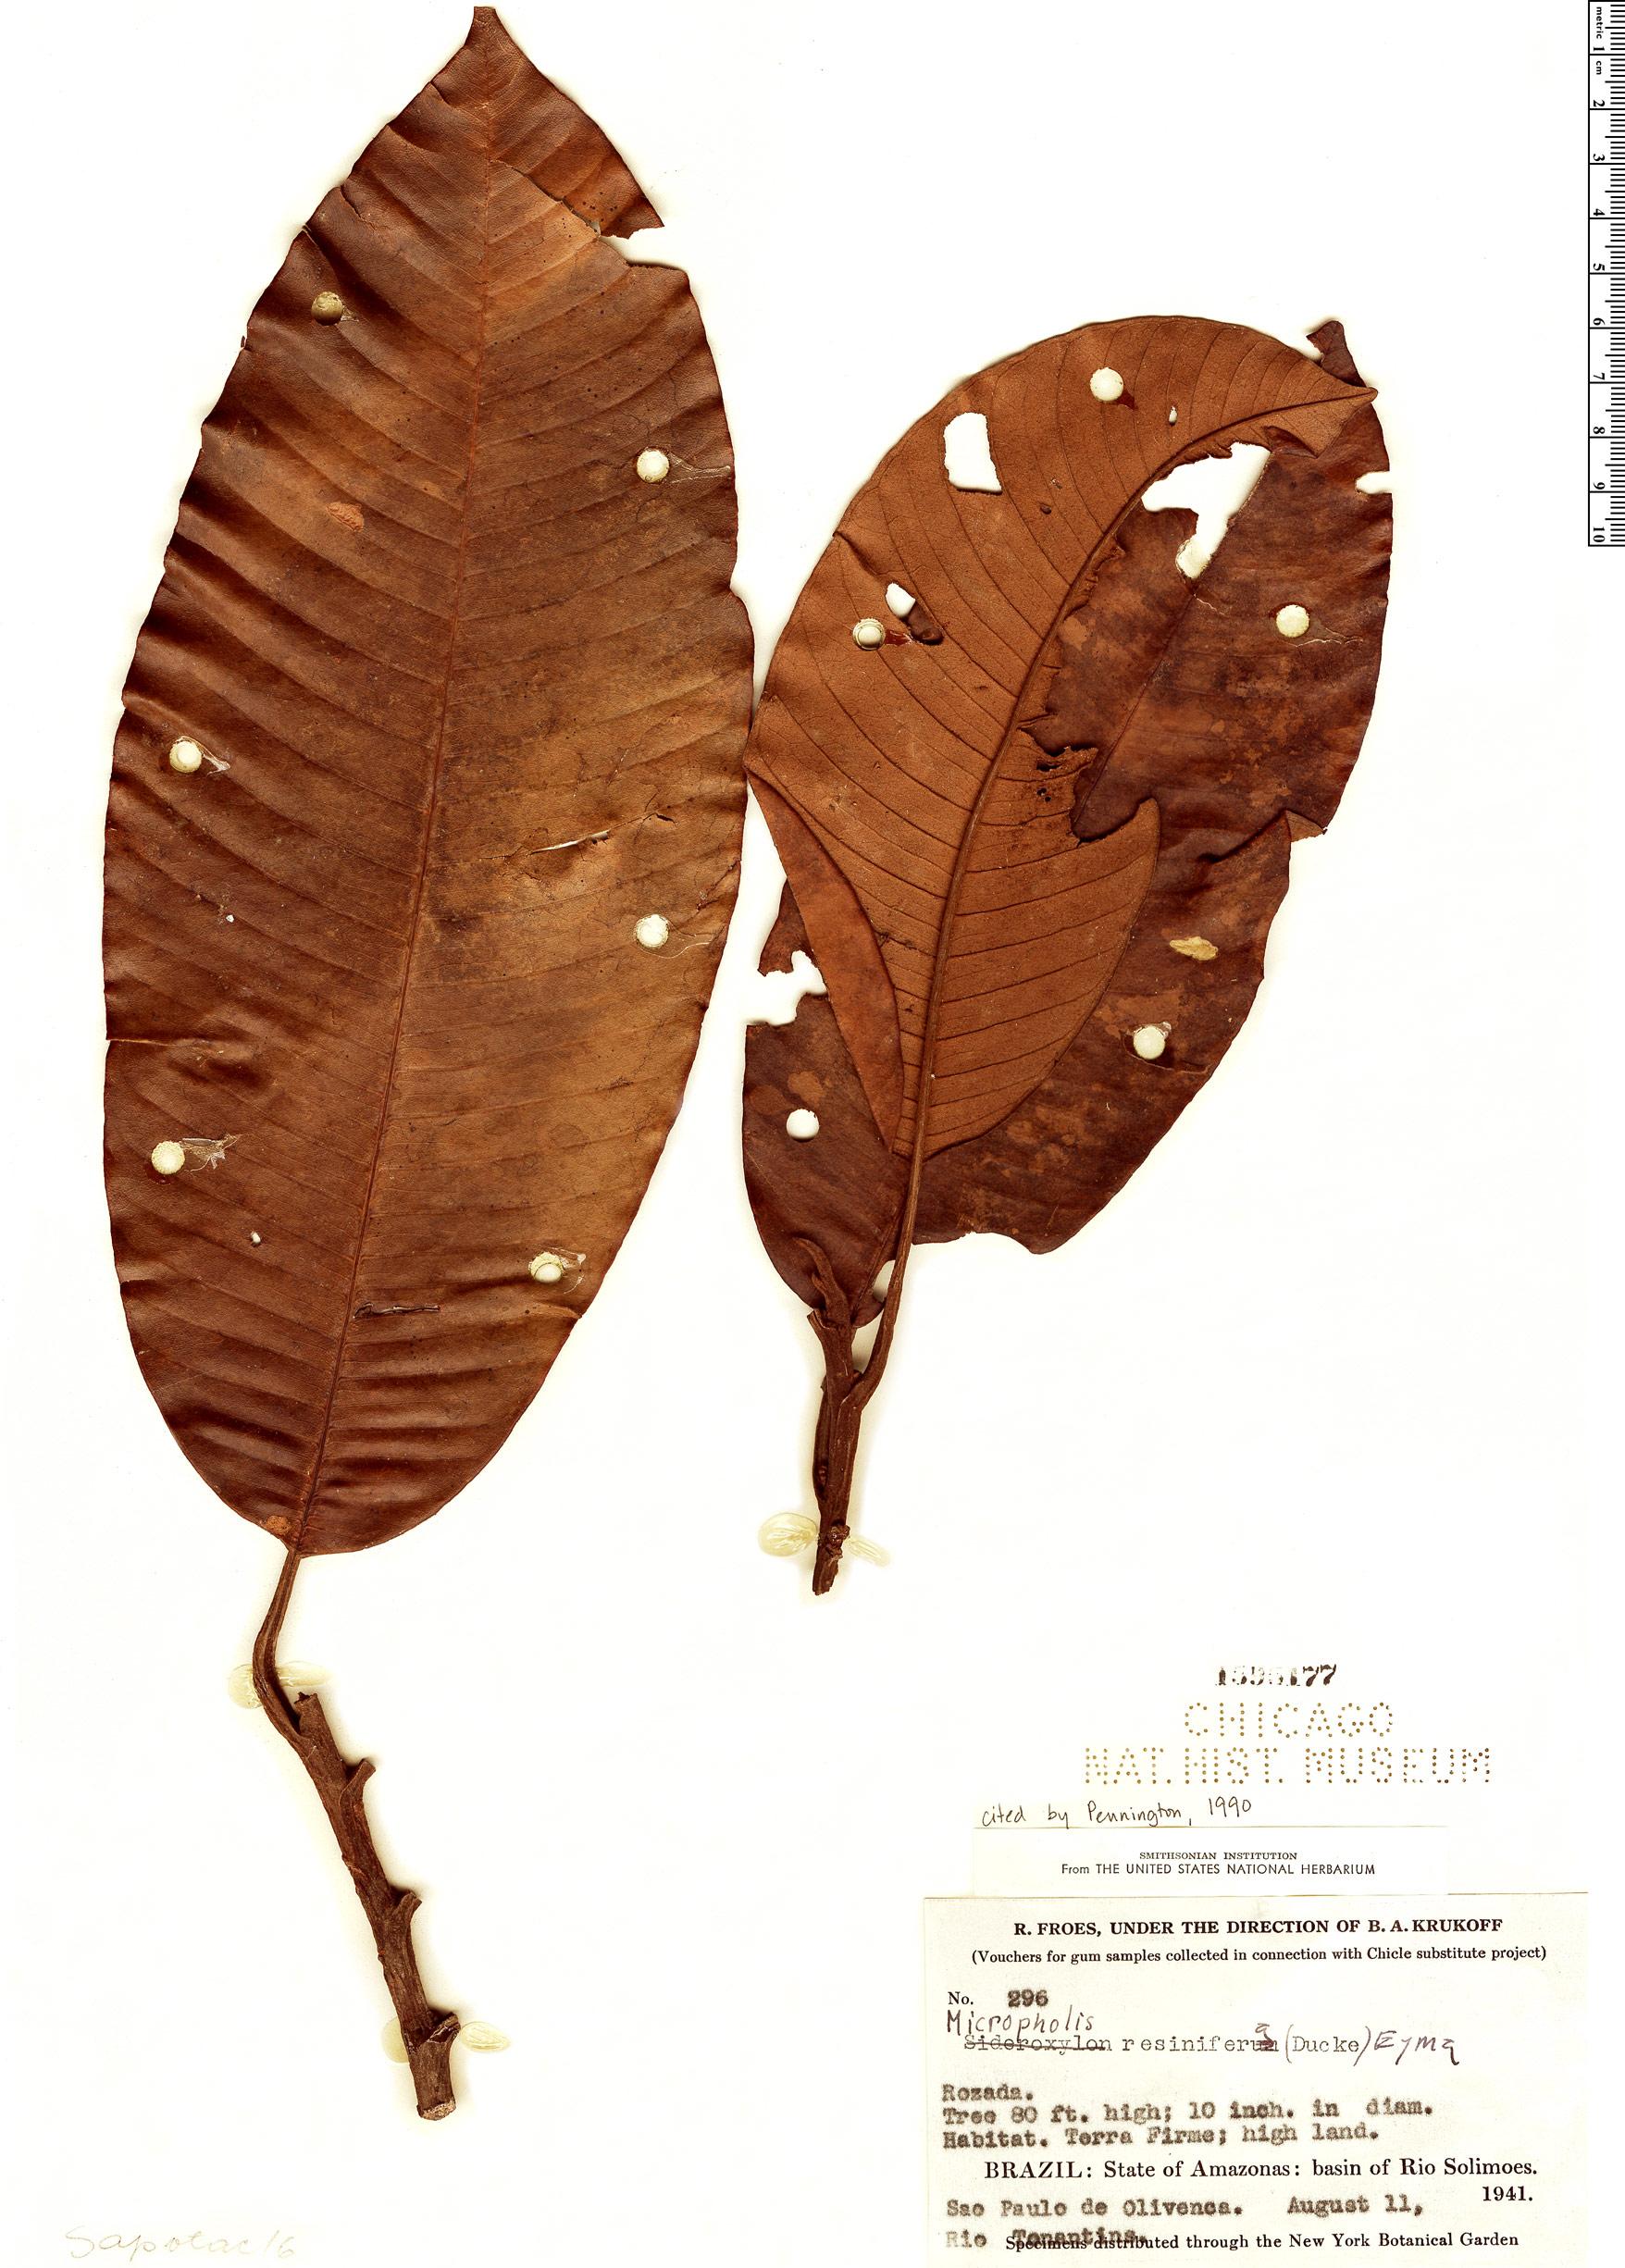 Specimen: Micropholis resinifera